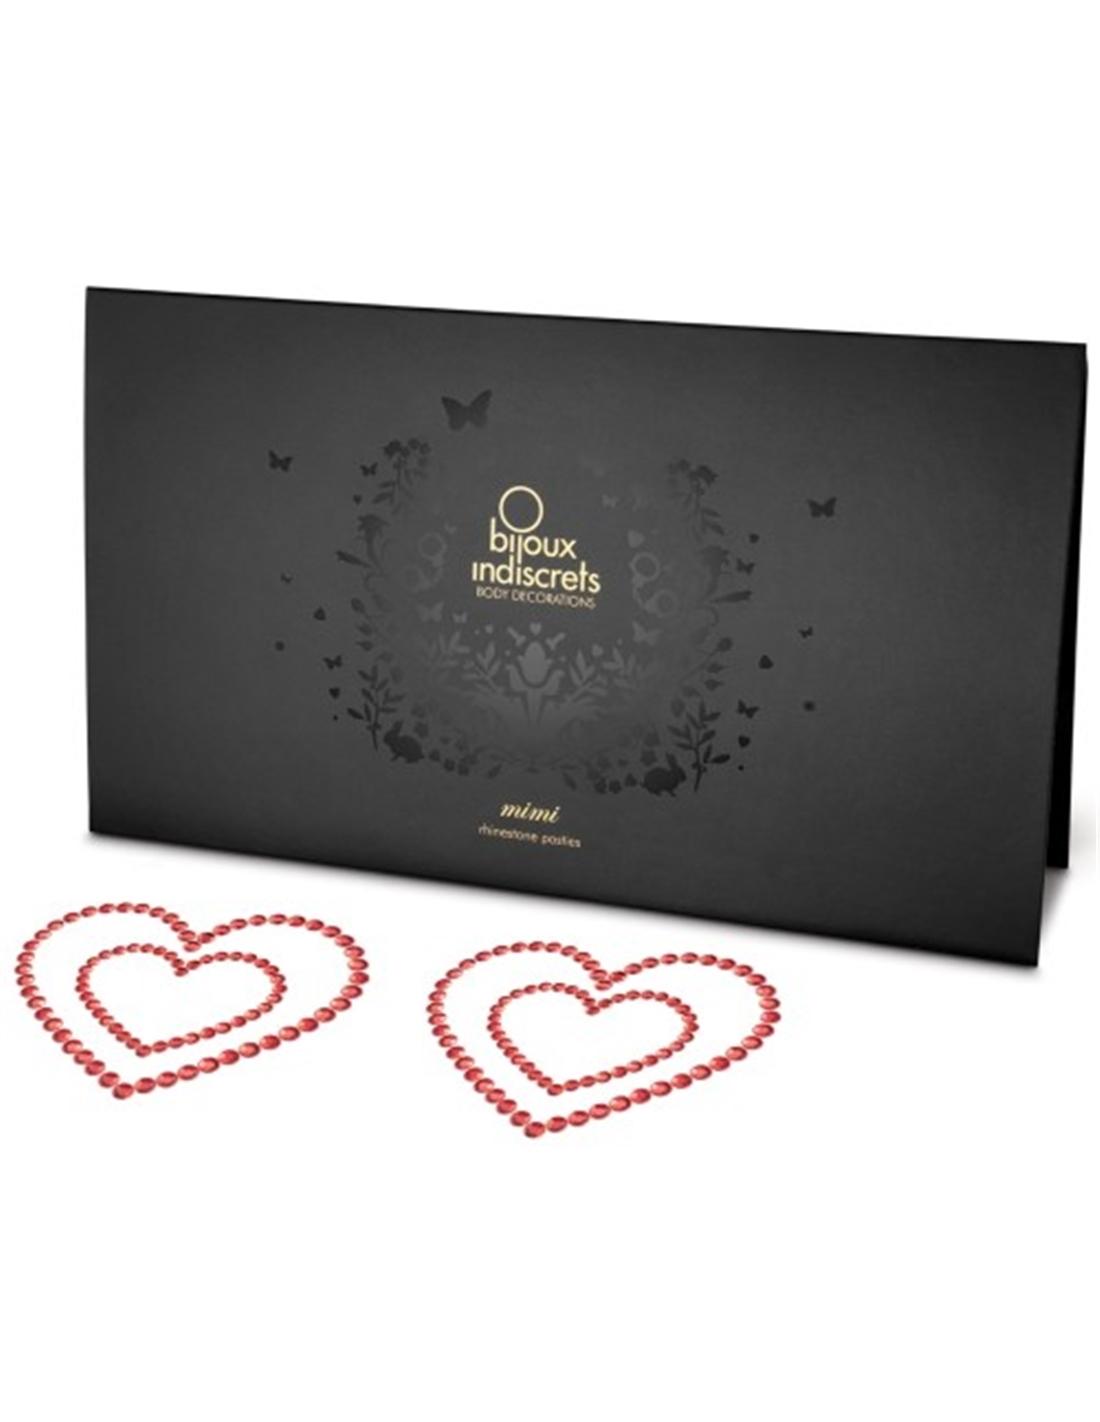 Tapa Mamilos Mimi Heart Bijoux Indiscrets Vermelhos - PR2010324325